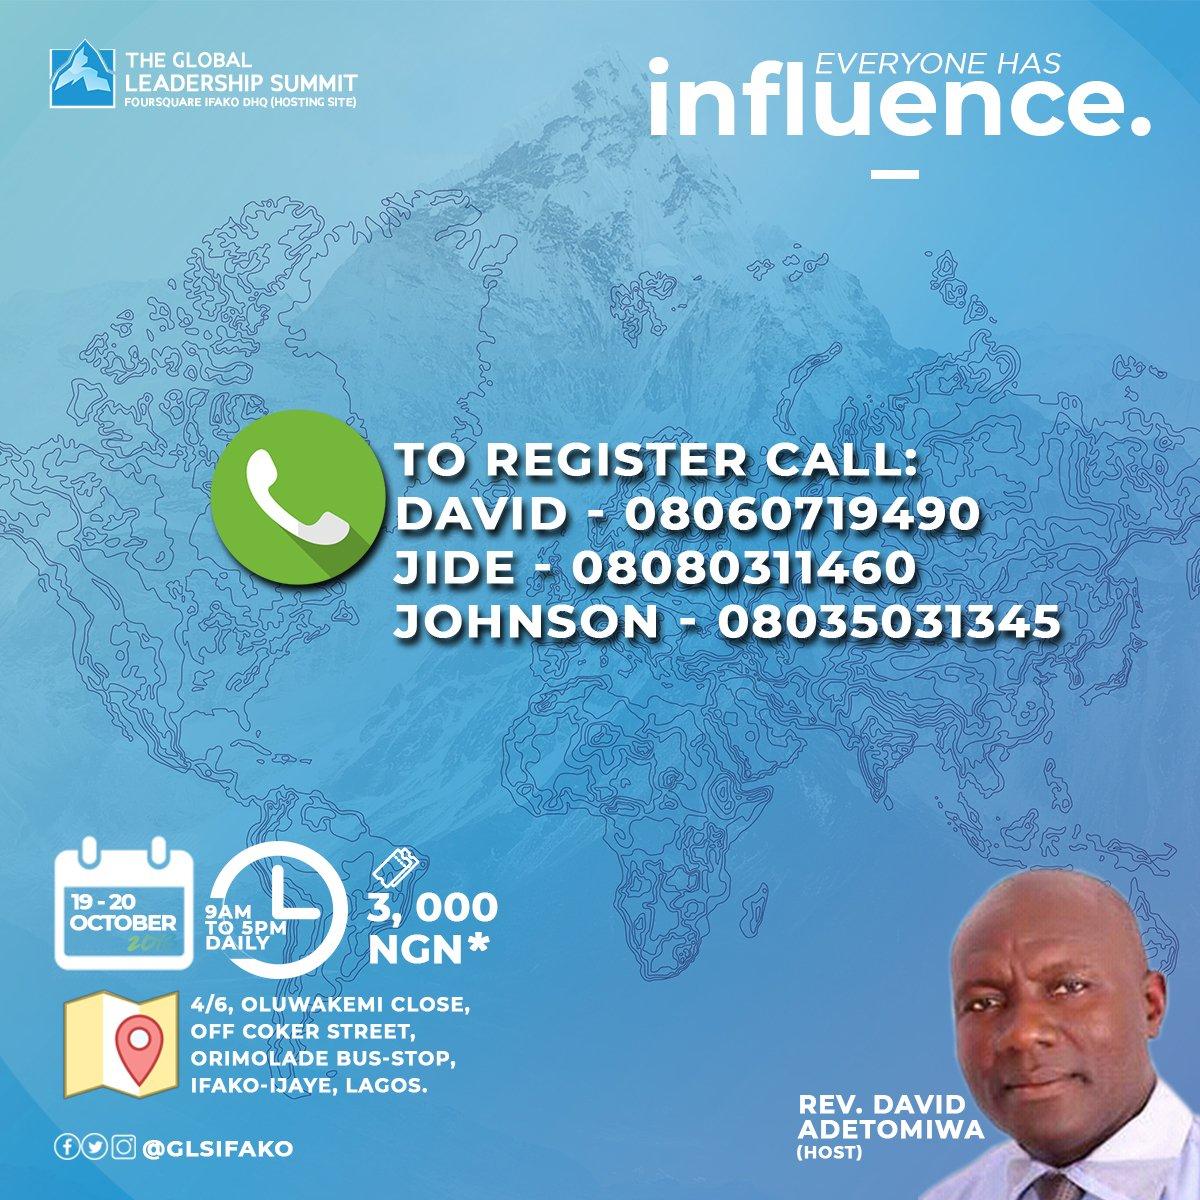 Global Leadership Summit 2018: Foursquare Gospel Church, Ifako DHQ Viewing Center Date: 19th - 20th Oct. 2018 Host: Rev. David Adetomiwa Venue: 4/6, Oluwakemi Close, Off Coker Street, Orimolade Bus-Stop, Ifako-Ijaye, Lagos  @wcagls #WCGLS #GLS18 #GLSNIG #FGCNIfako<br>http://pic.twitter.com/RSa4e3NDnj